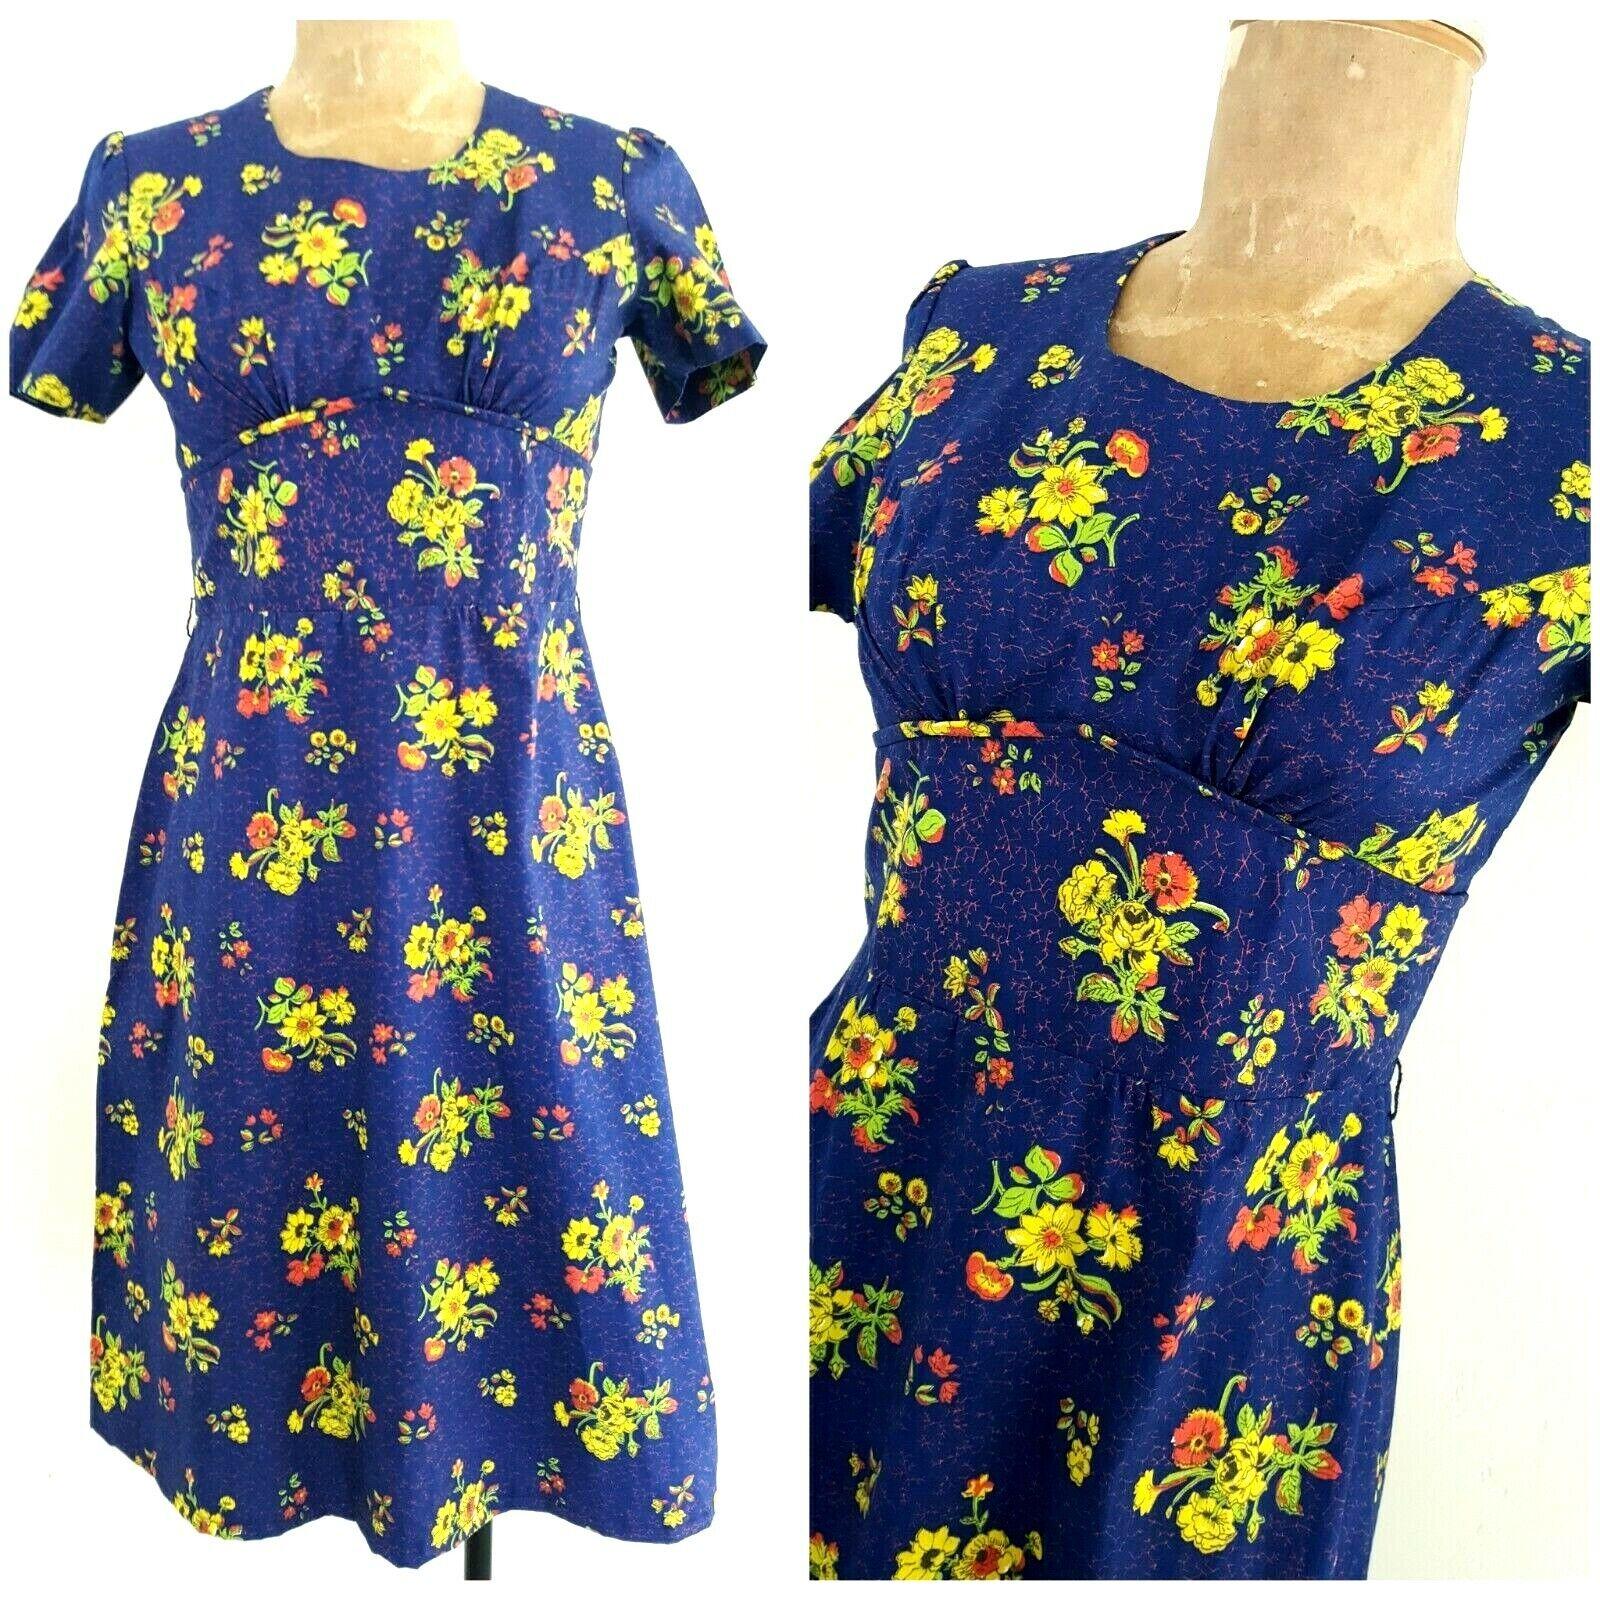 Vintage 60s  Rockabilly Empire Waist Floral Dress Größe Small Pinup Mini GOGO